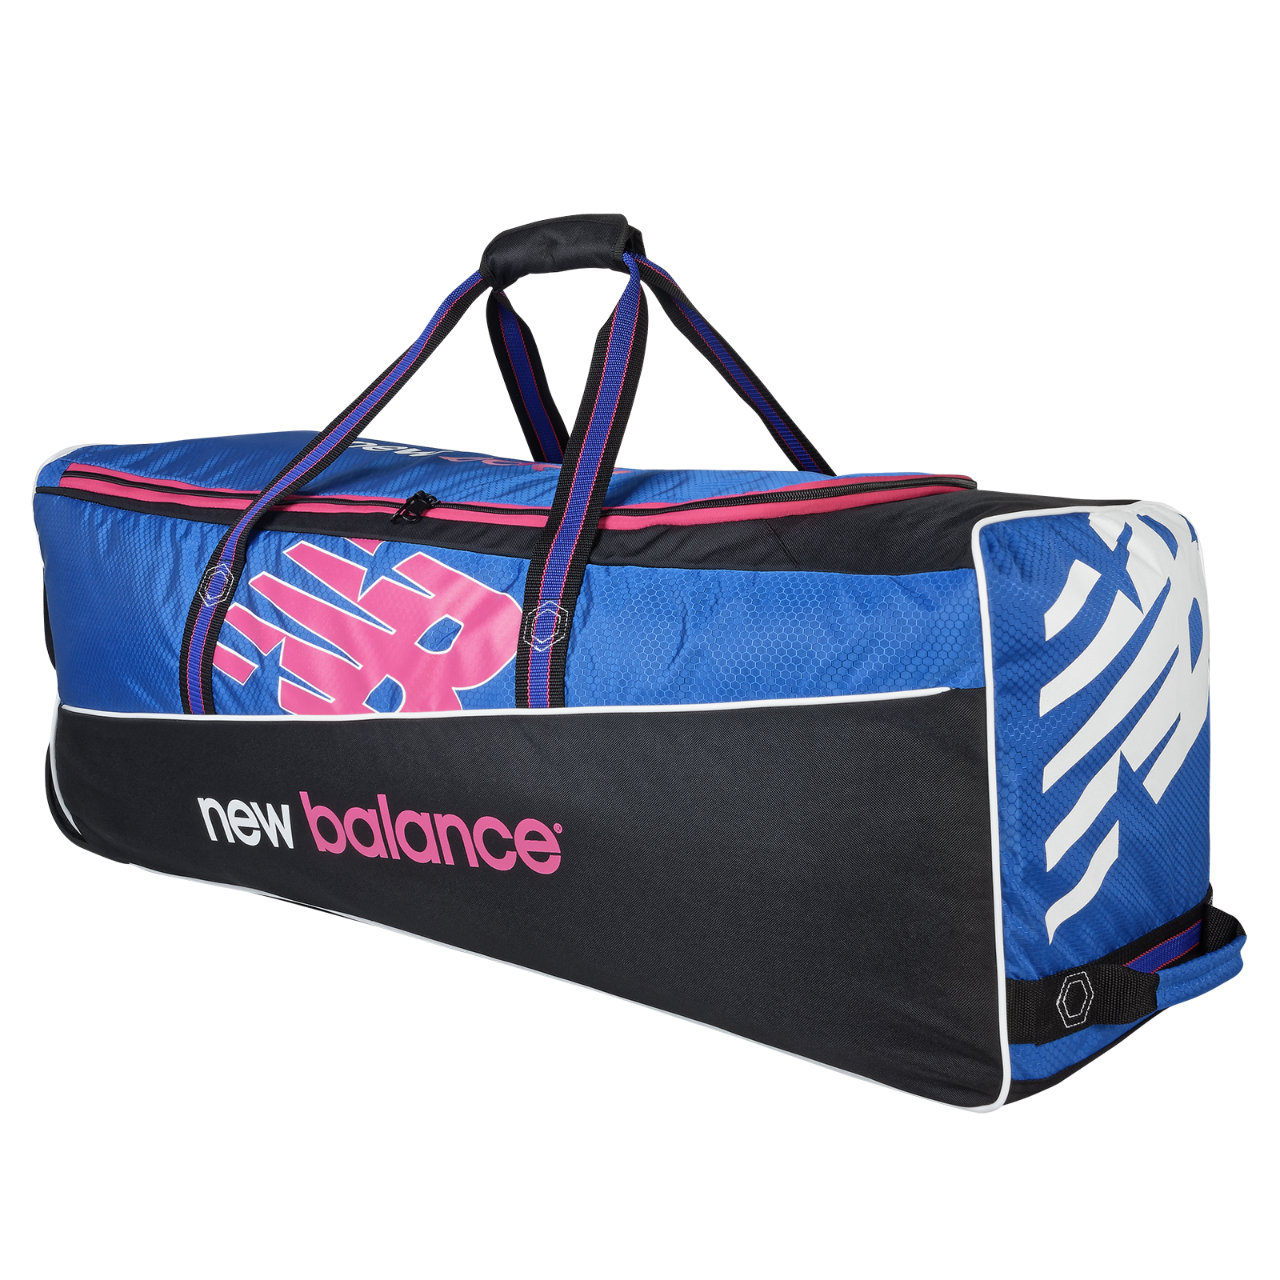 2021 New Balance Burn 670 Wheelie Cricket Bag